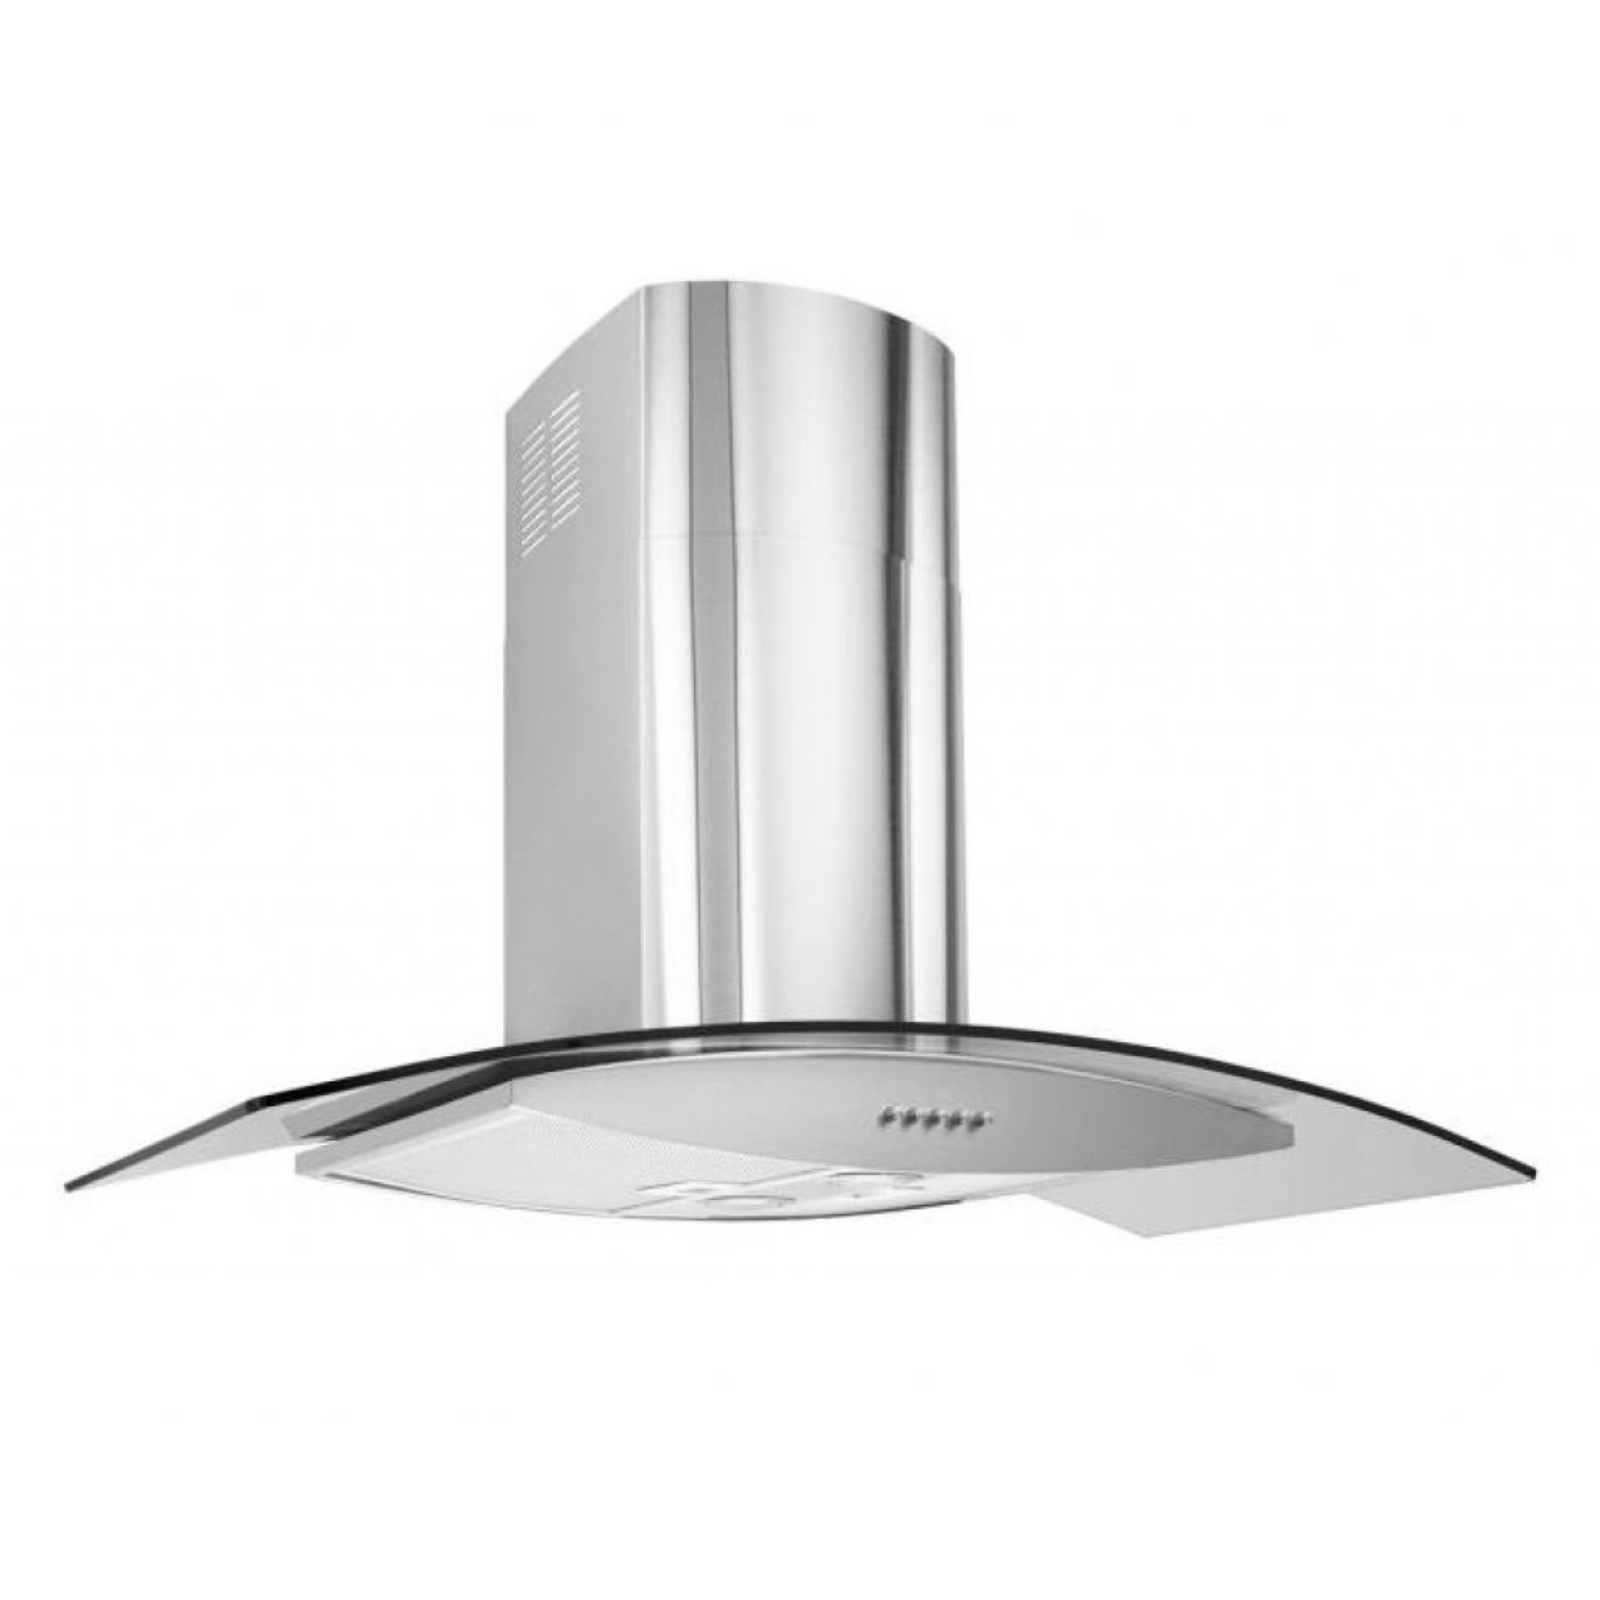 Вытяжка кухонная Ventolux RIALTO 60 BK (750) TRC